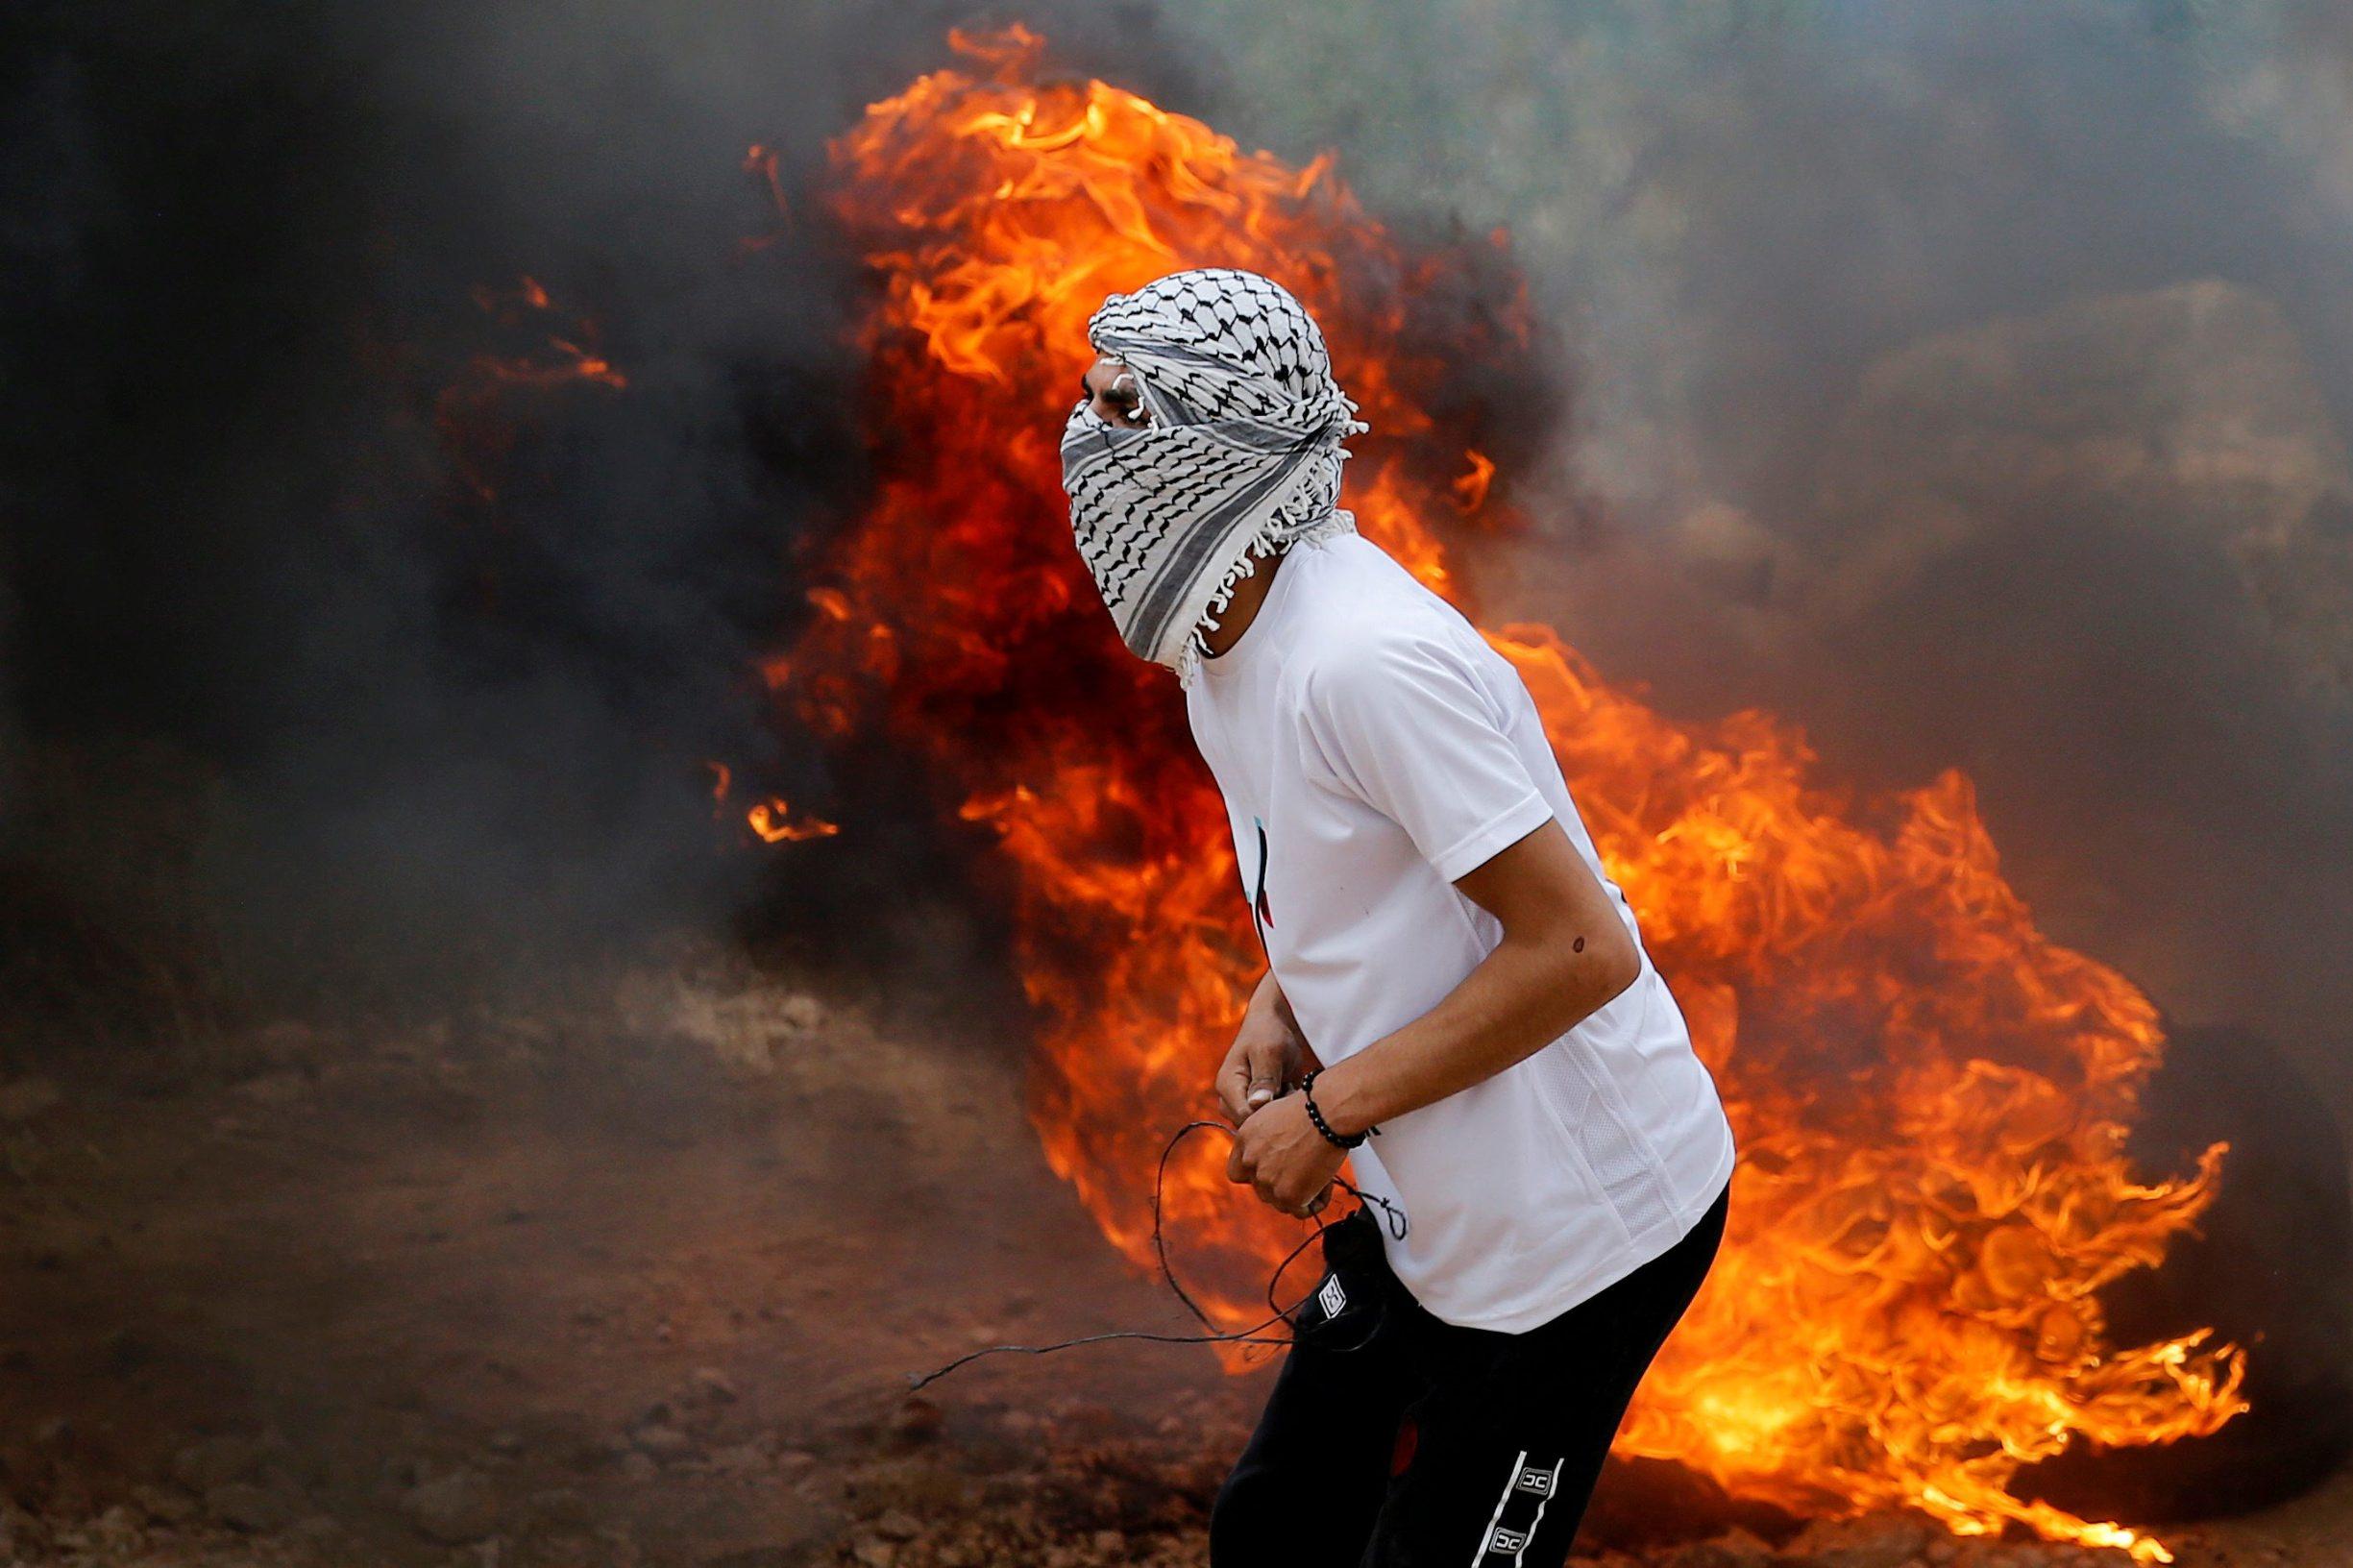 2019-11-15T000000Z_304468514_RC2OBD9VJ6XX_RTRMADP_3_ISRAEL-PALESTINIANS-VIOLENCE